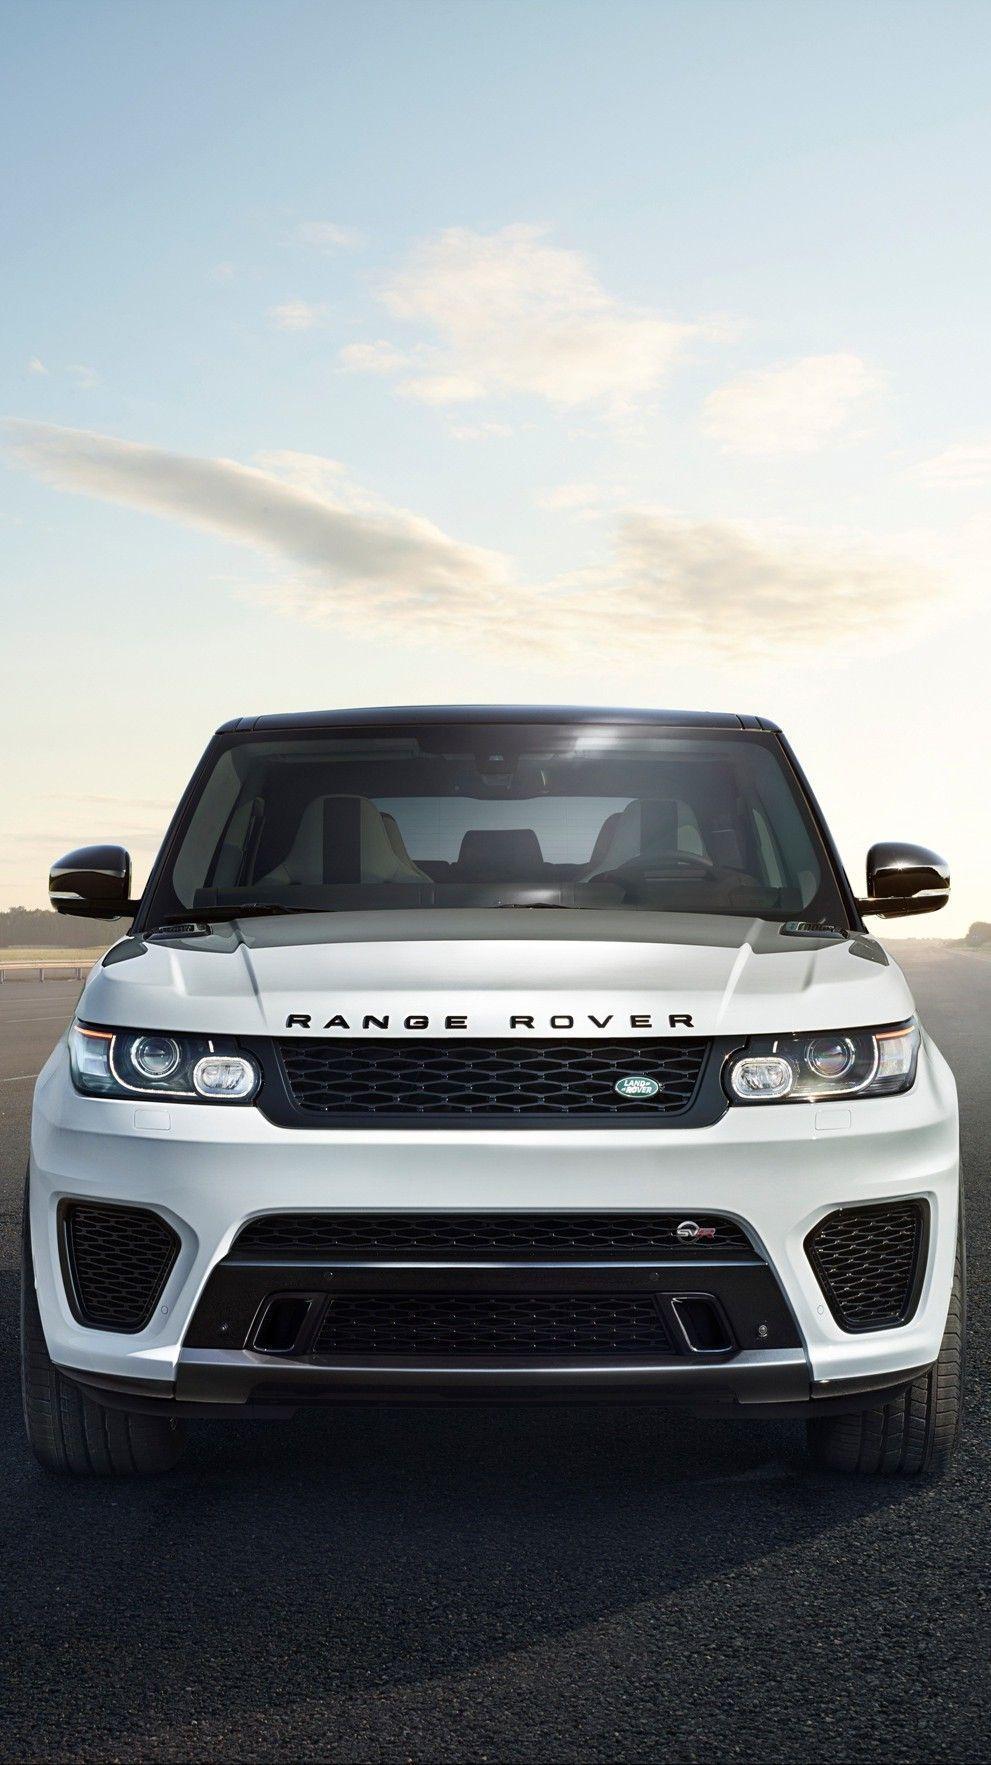 Range Rover Iphone Wallpapers Wallpaper Cave